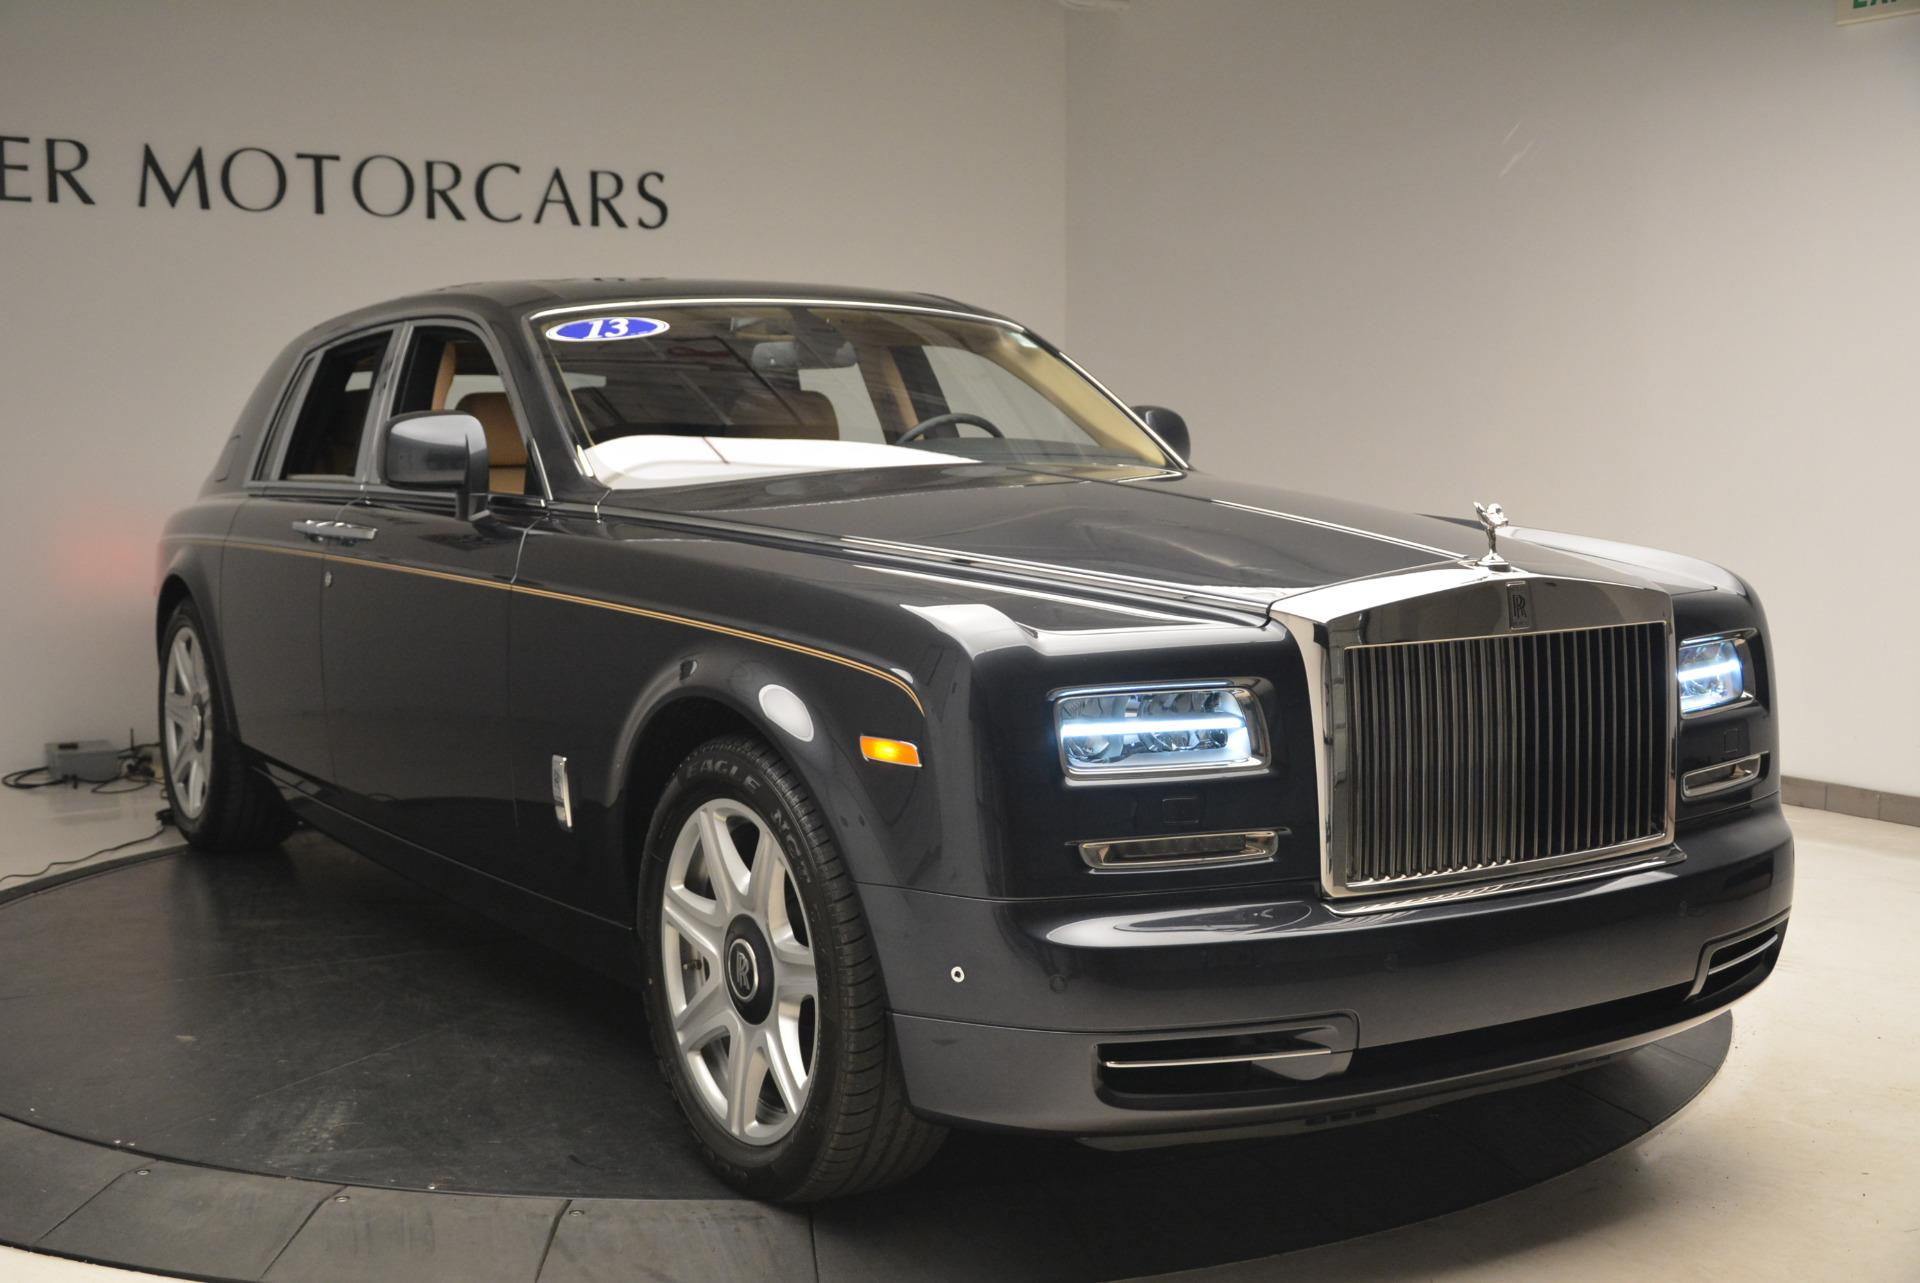 Used 2013 Rolls-Royce Phantom  For Sale In Greenwich, CT. Alfa Romeo of Greenwich, 7353 2208_p2